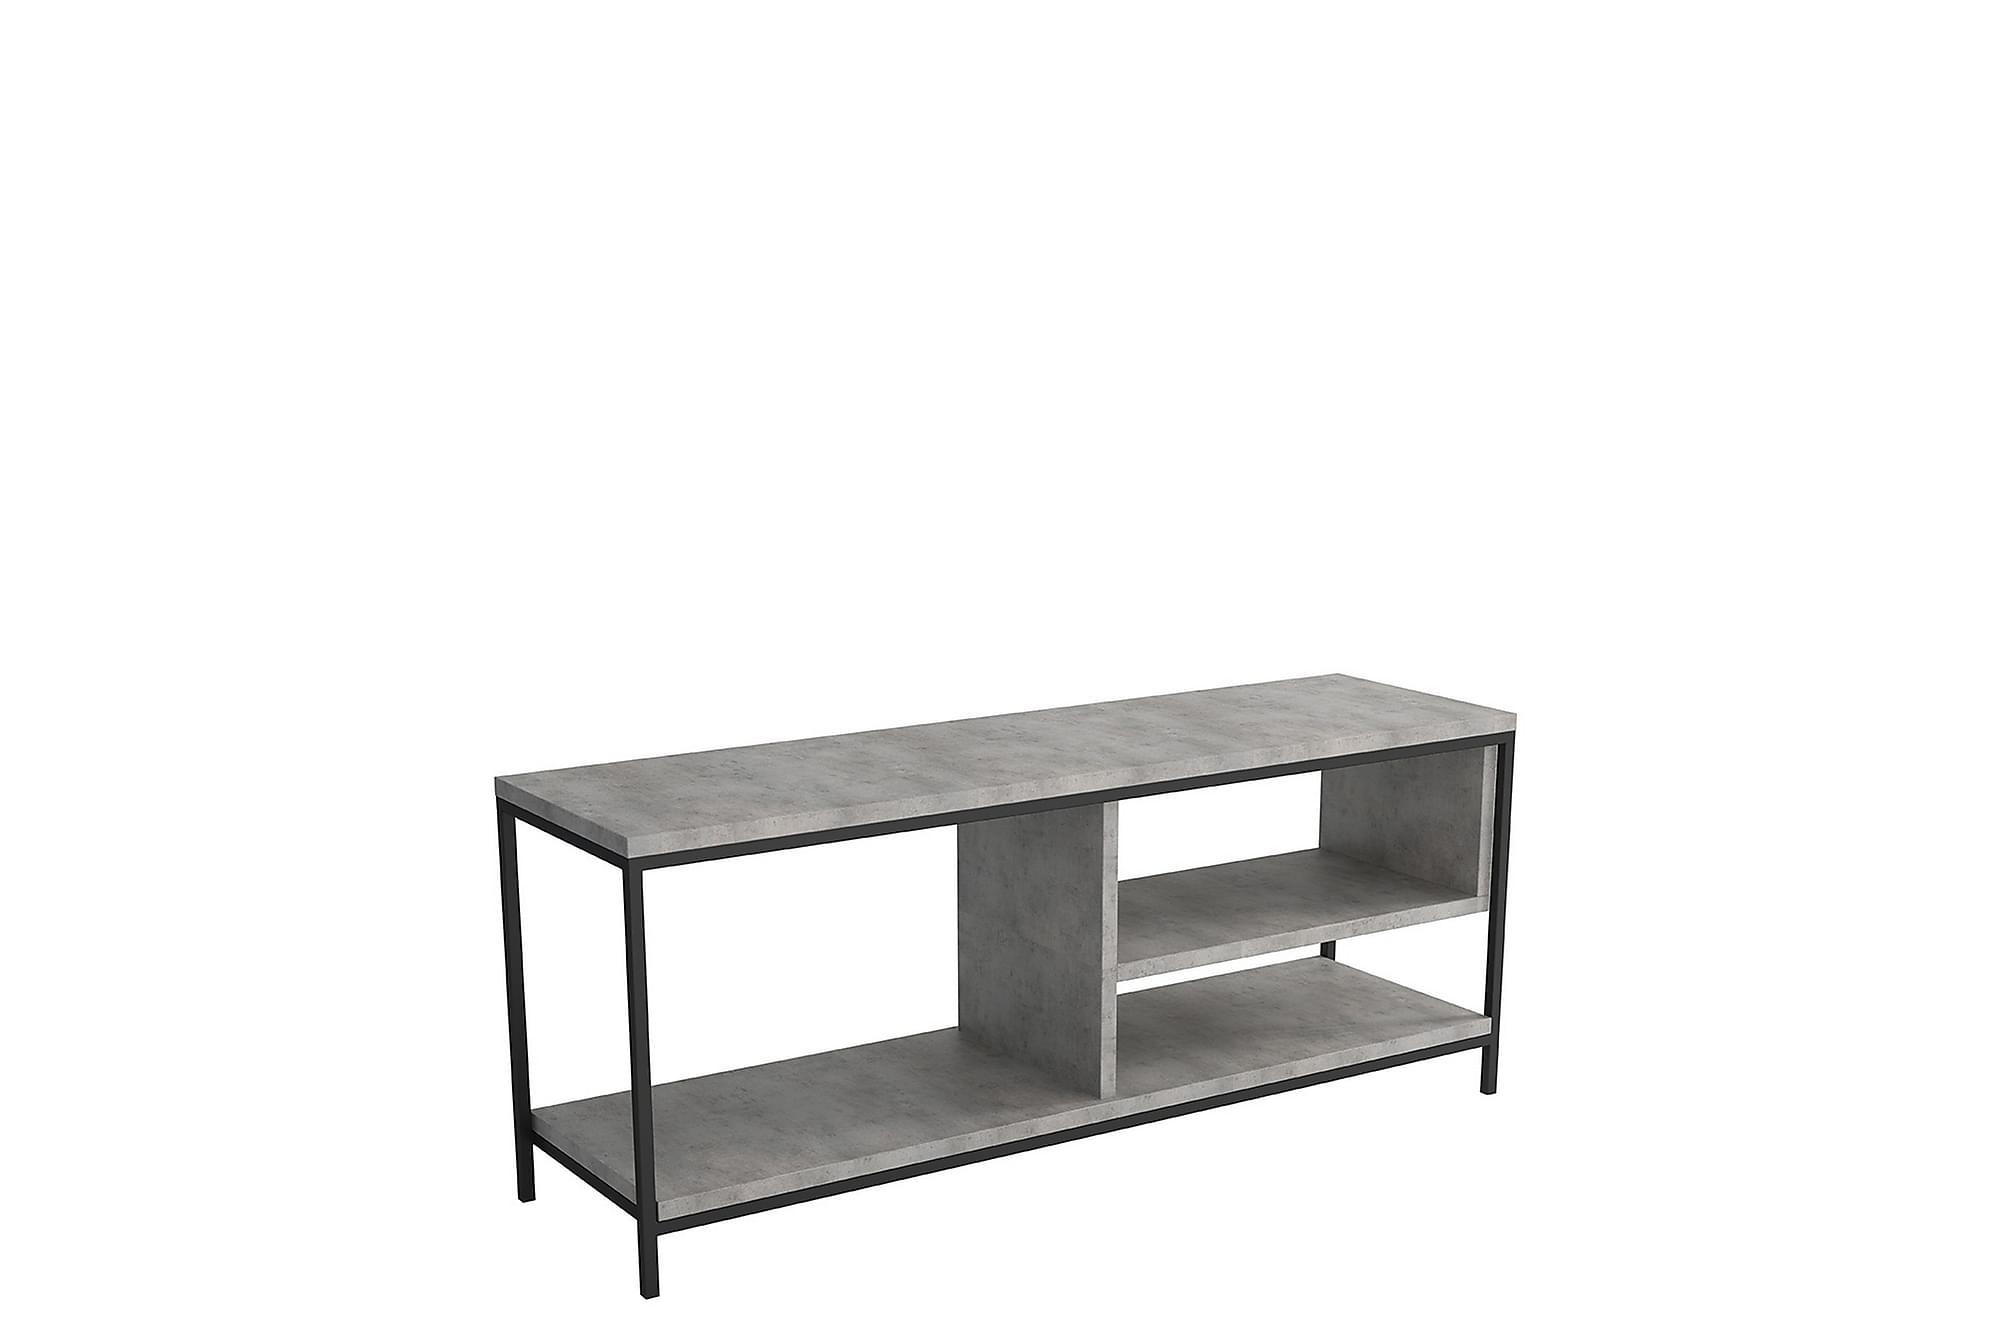 Norrotez tv-bänk grå/svart